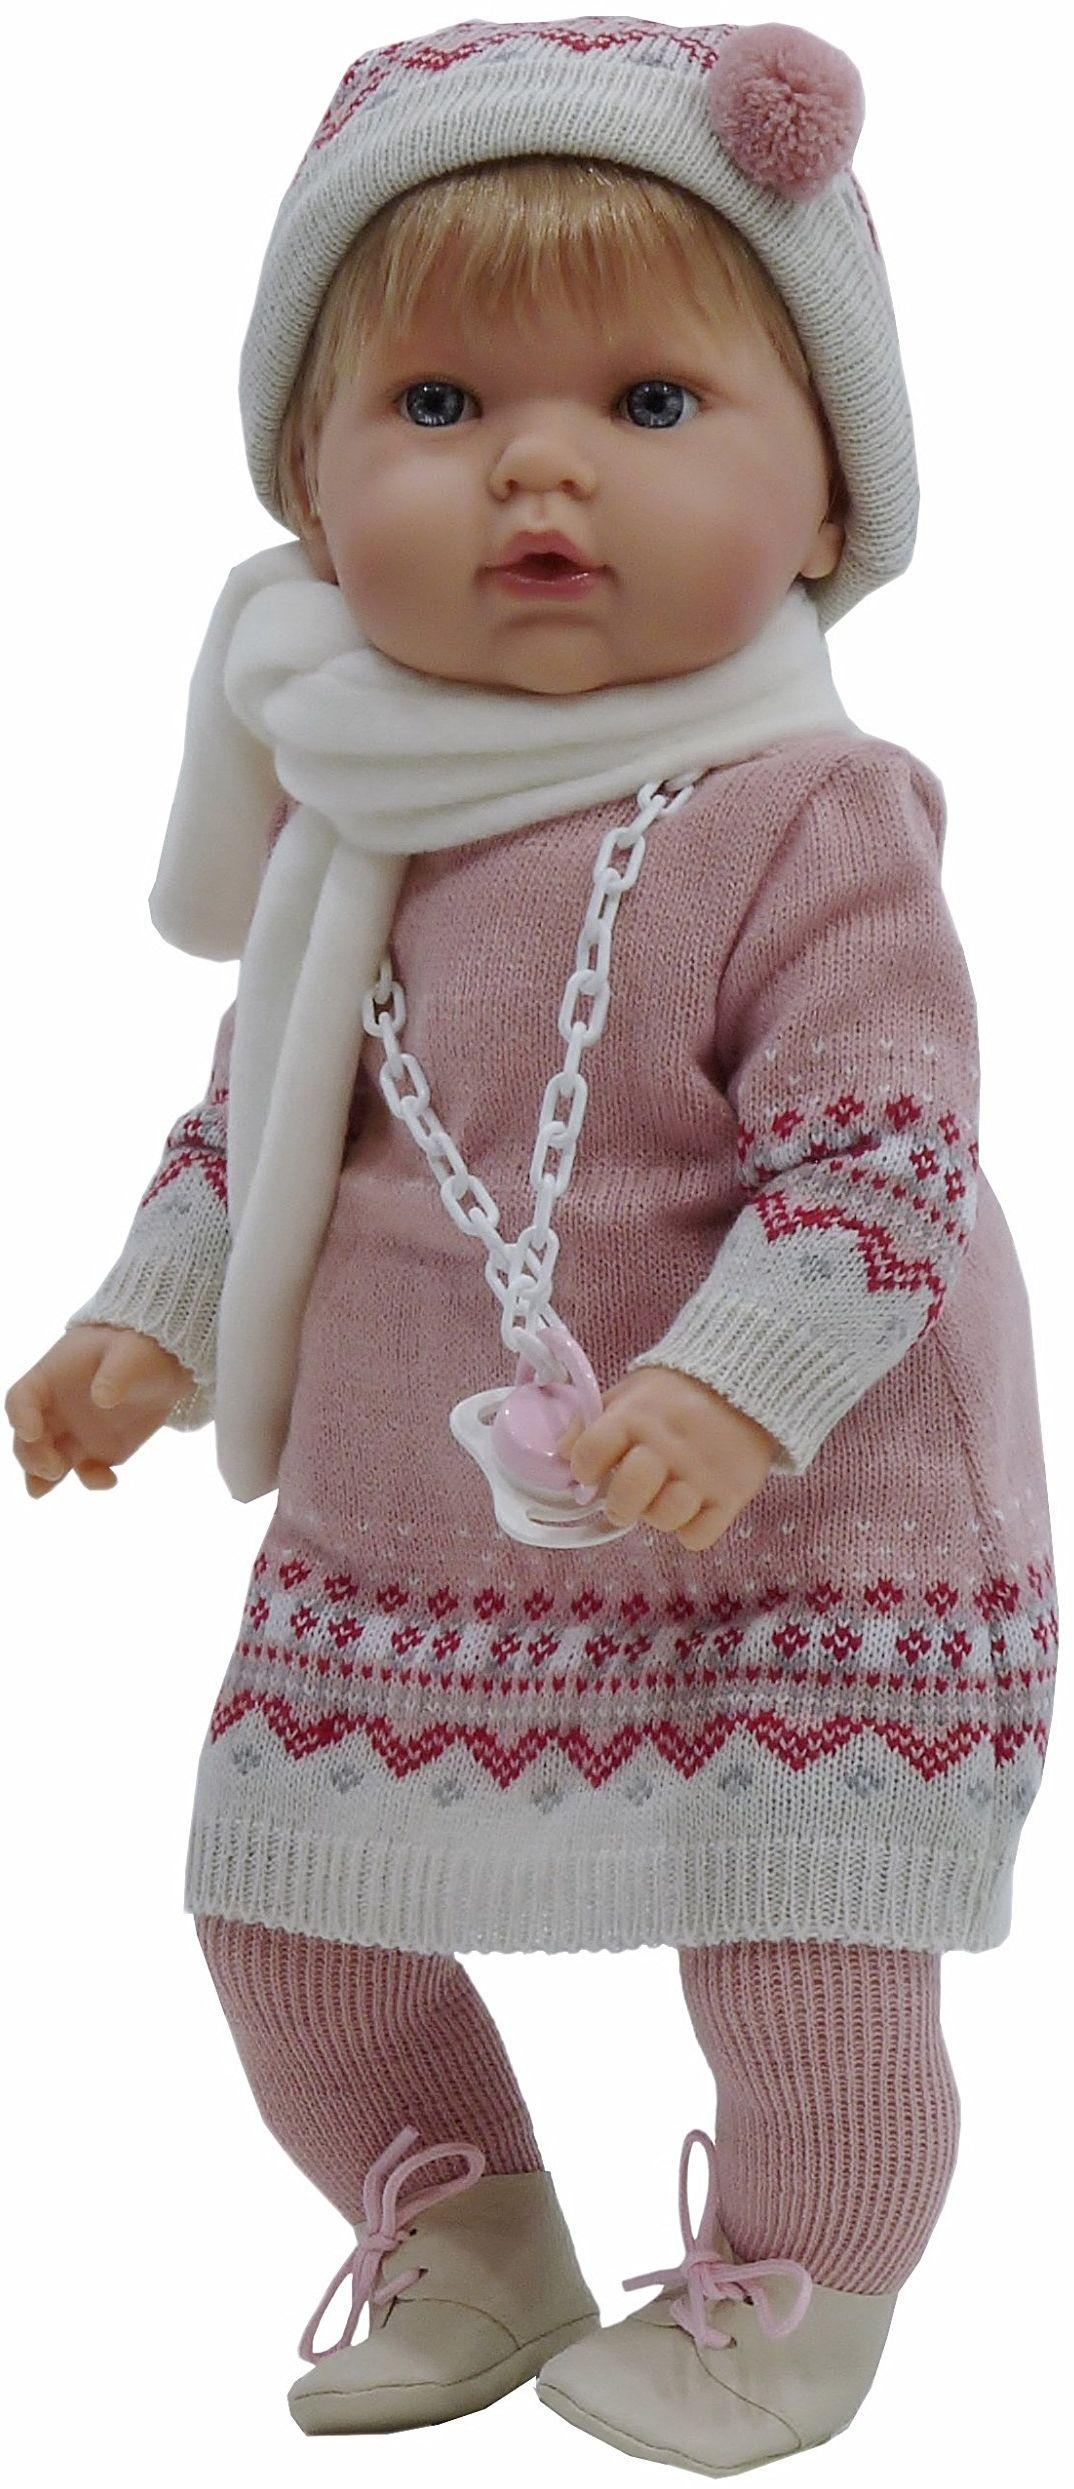 Nines Artesanals d''Onil - Tita, lalka dziecięca z smoczkiem (1080)